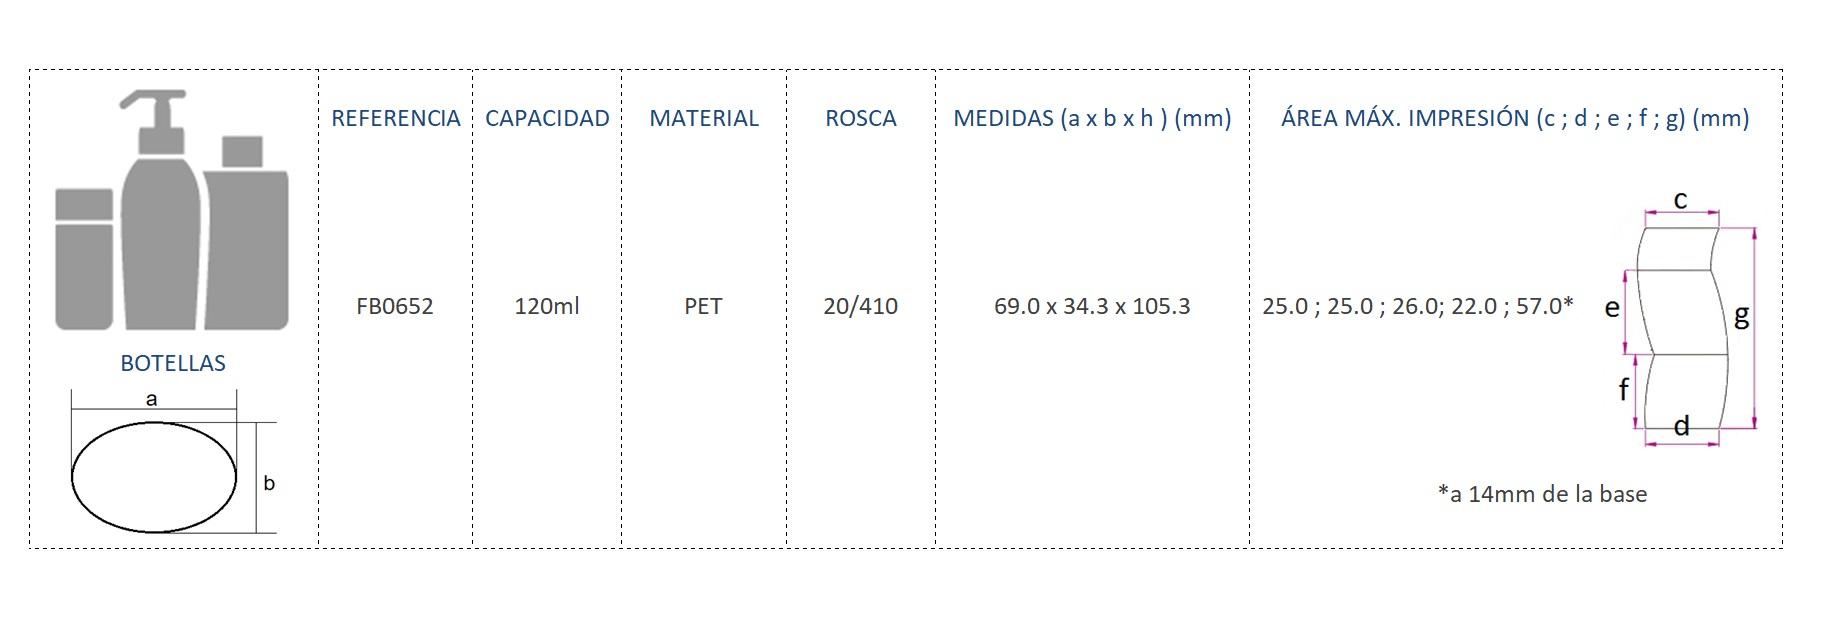 Cuadro de materiales botella FB0652